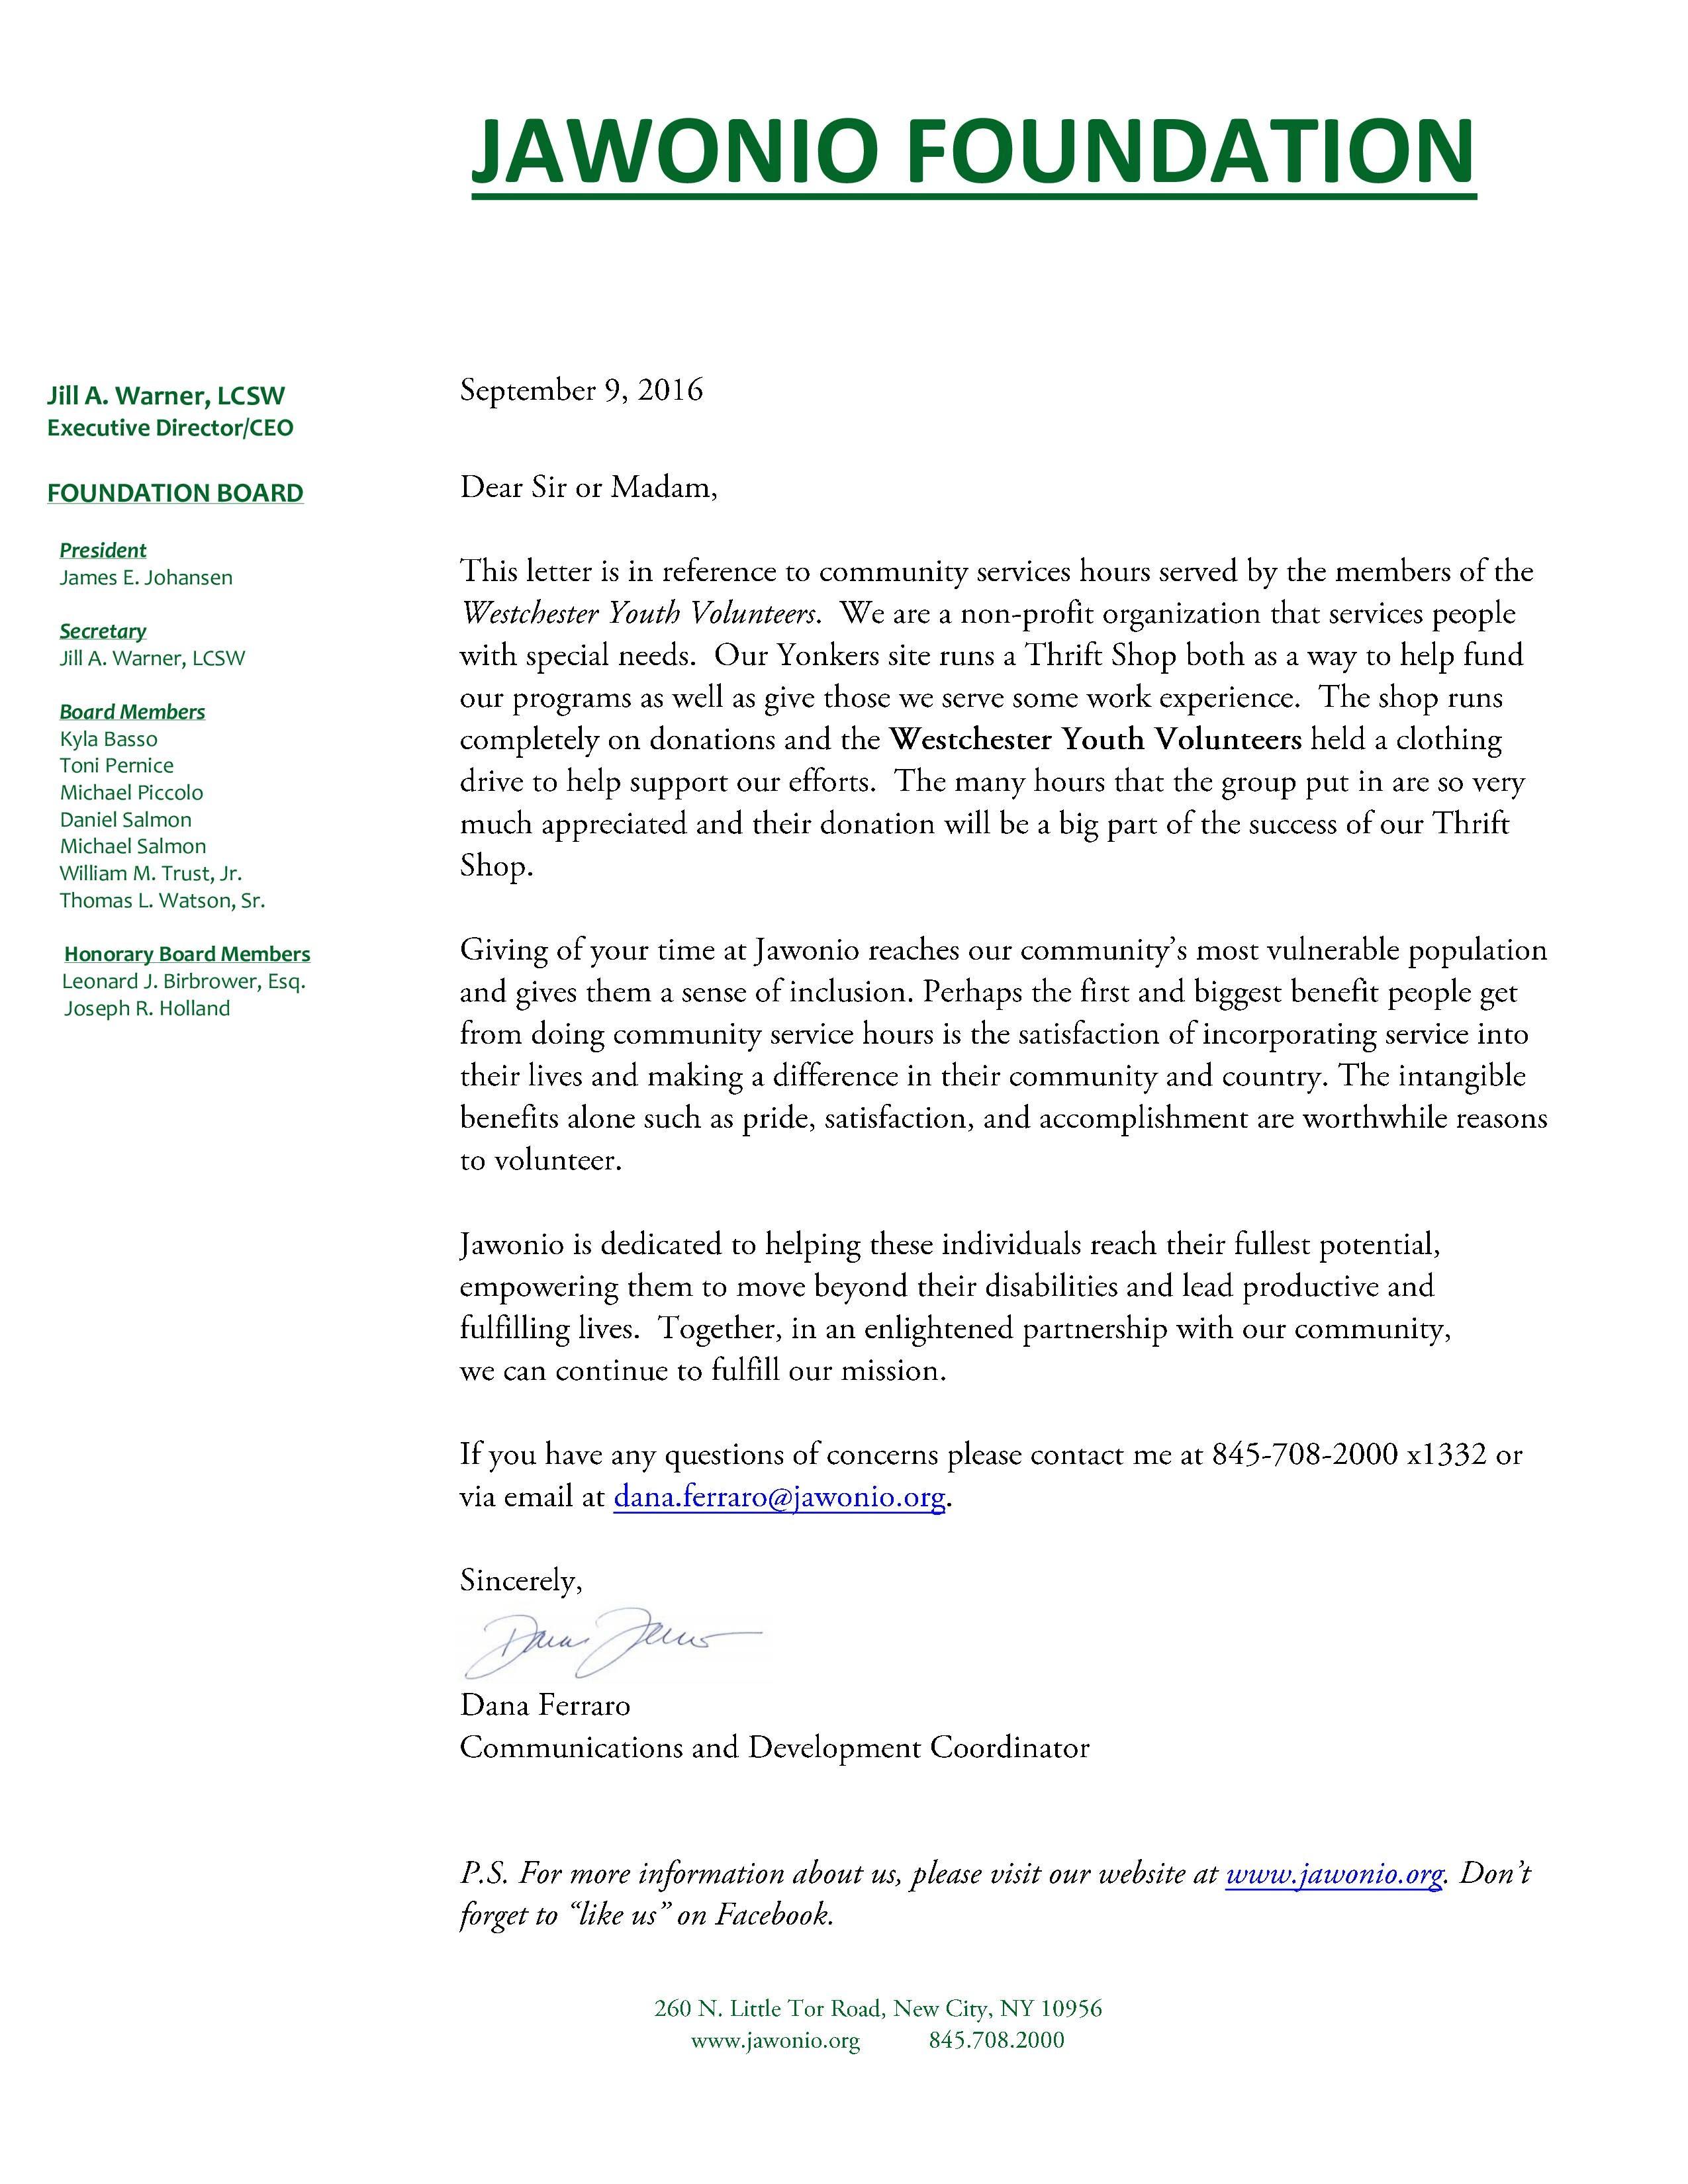 community service hours letter-Westchest